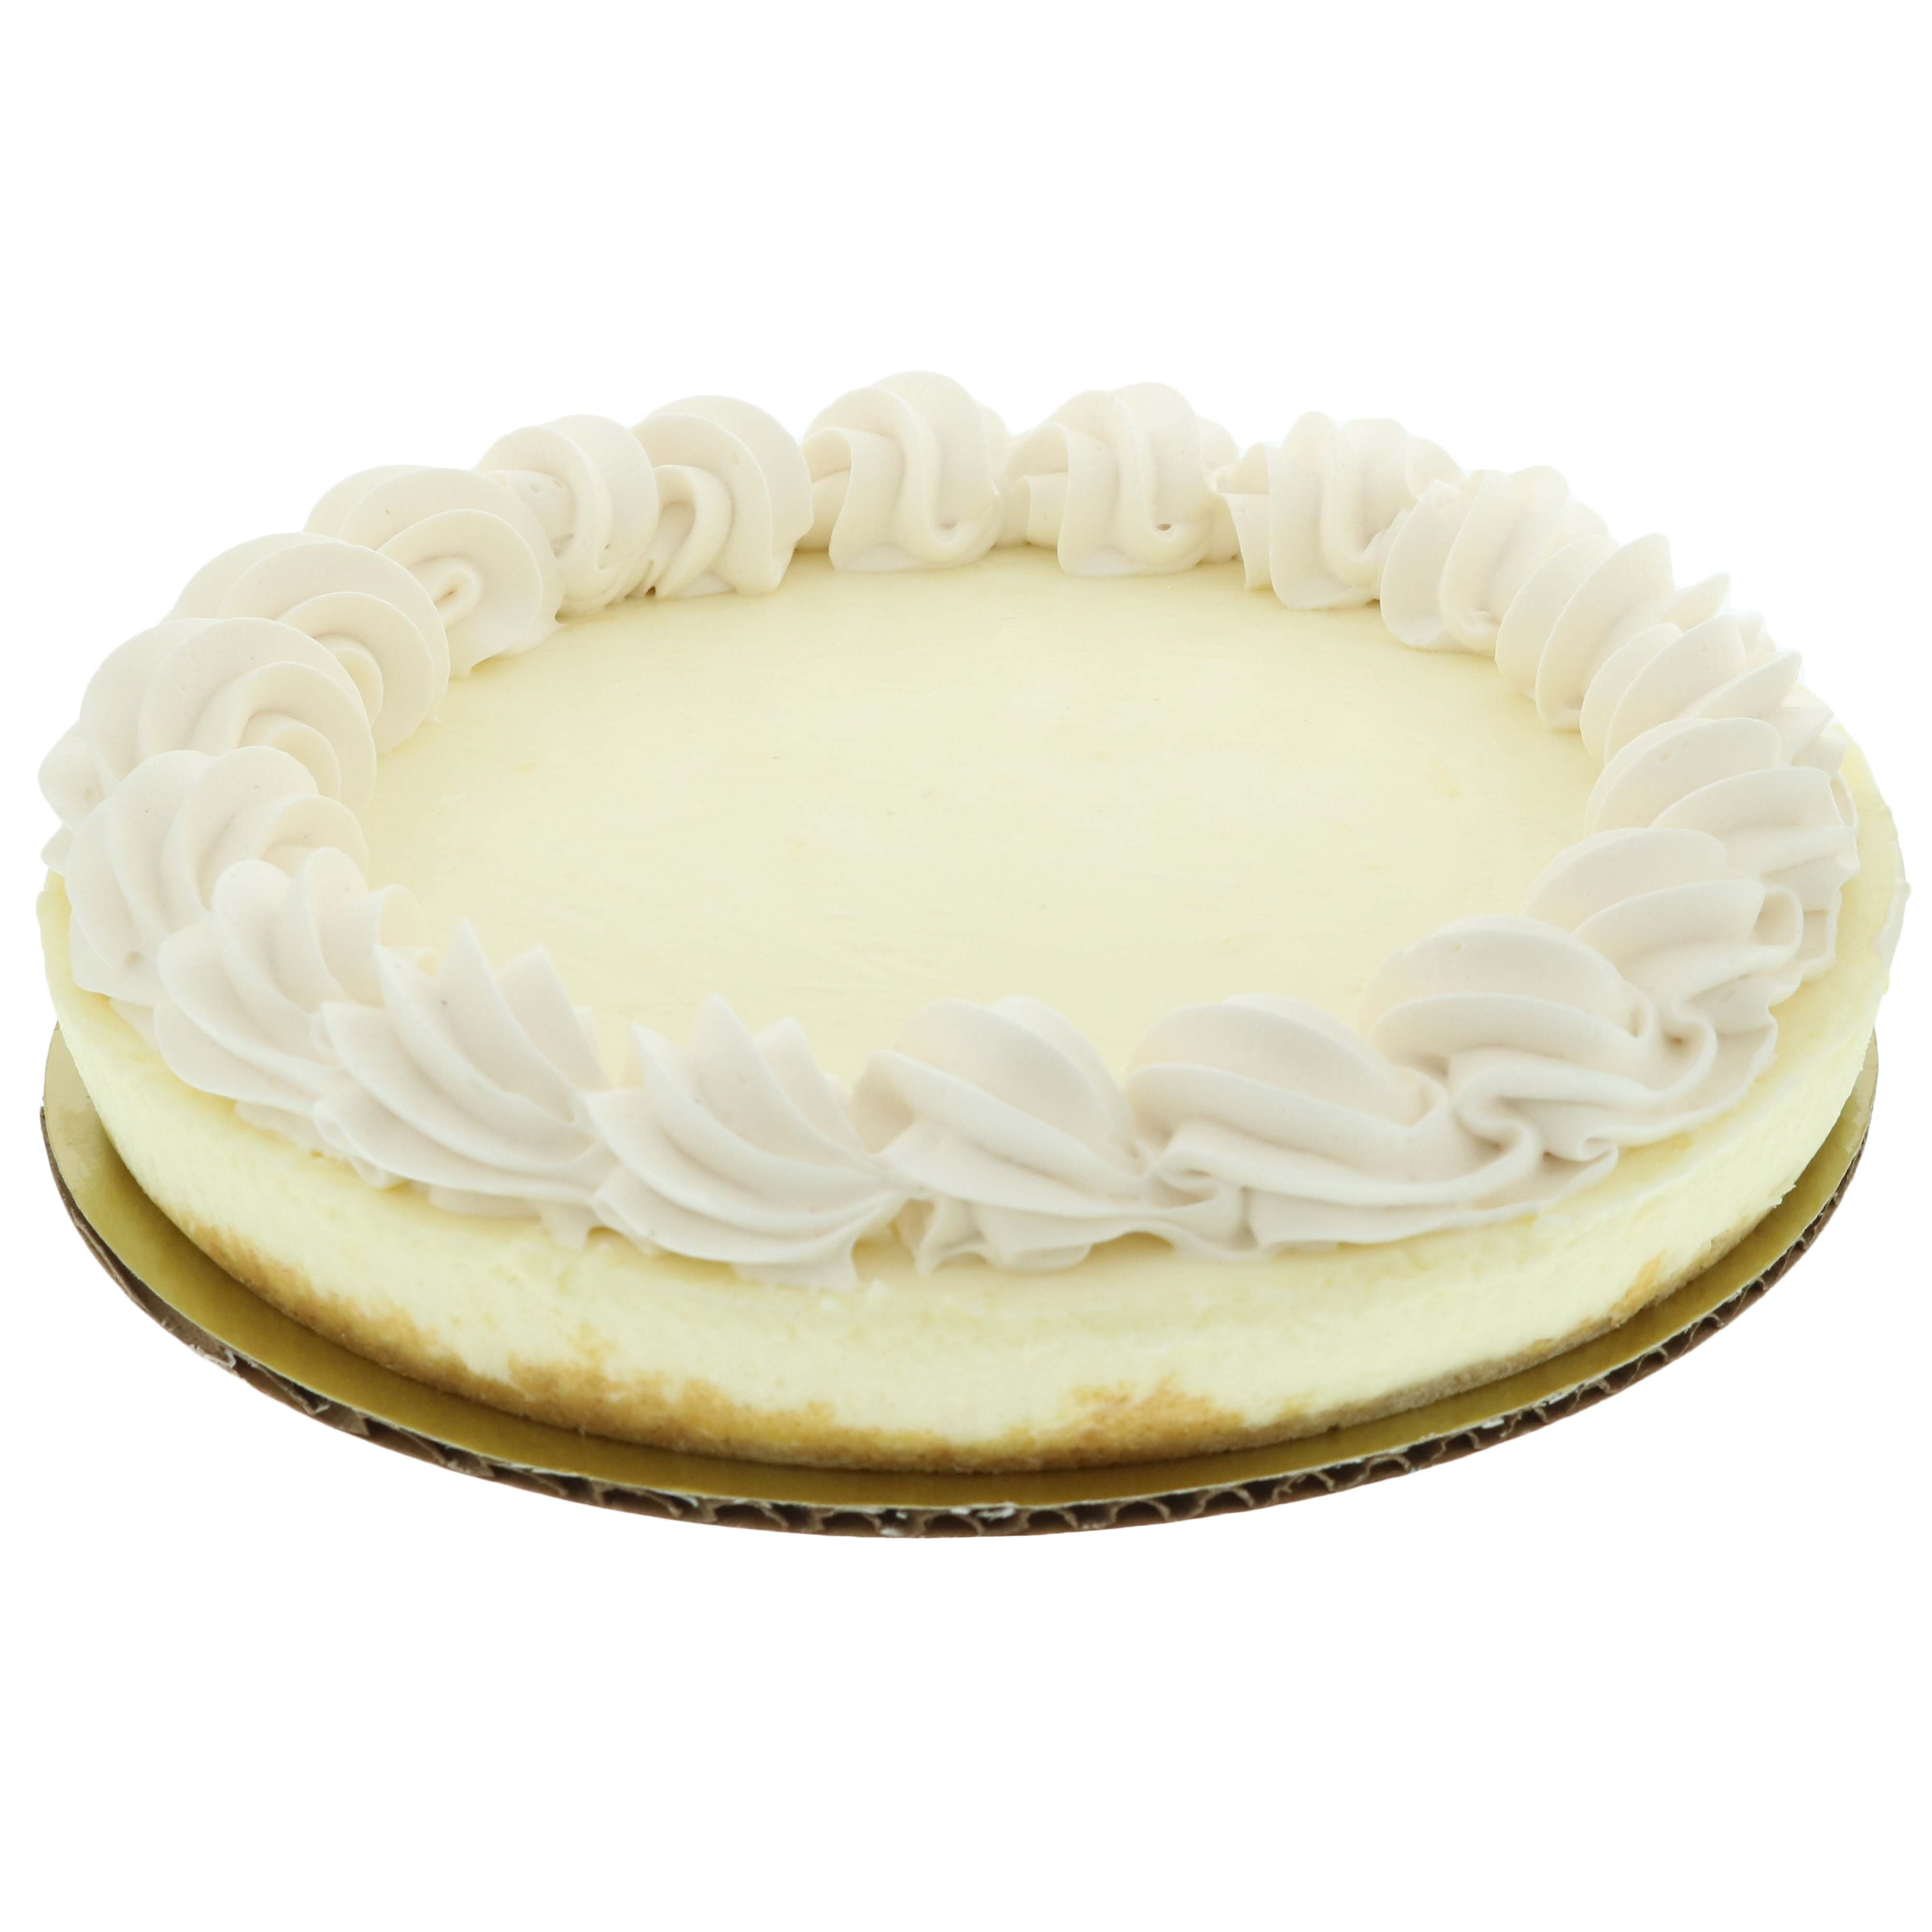 H E B Plain Cheesecake Shop Desserts Pastries At H E B